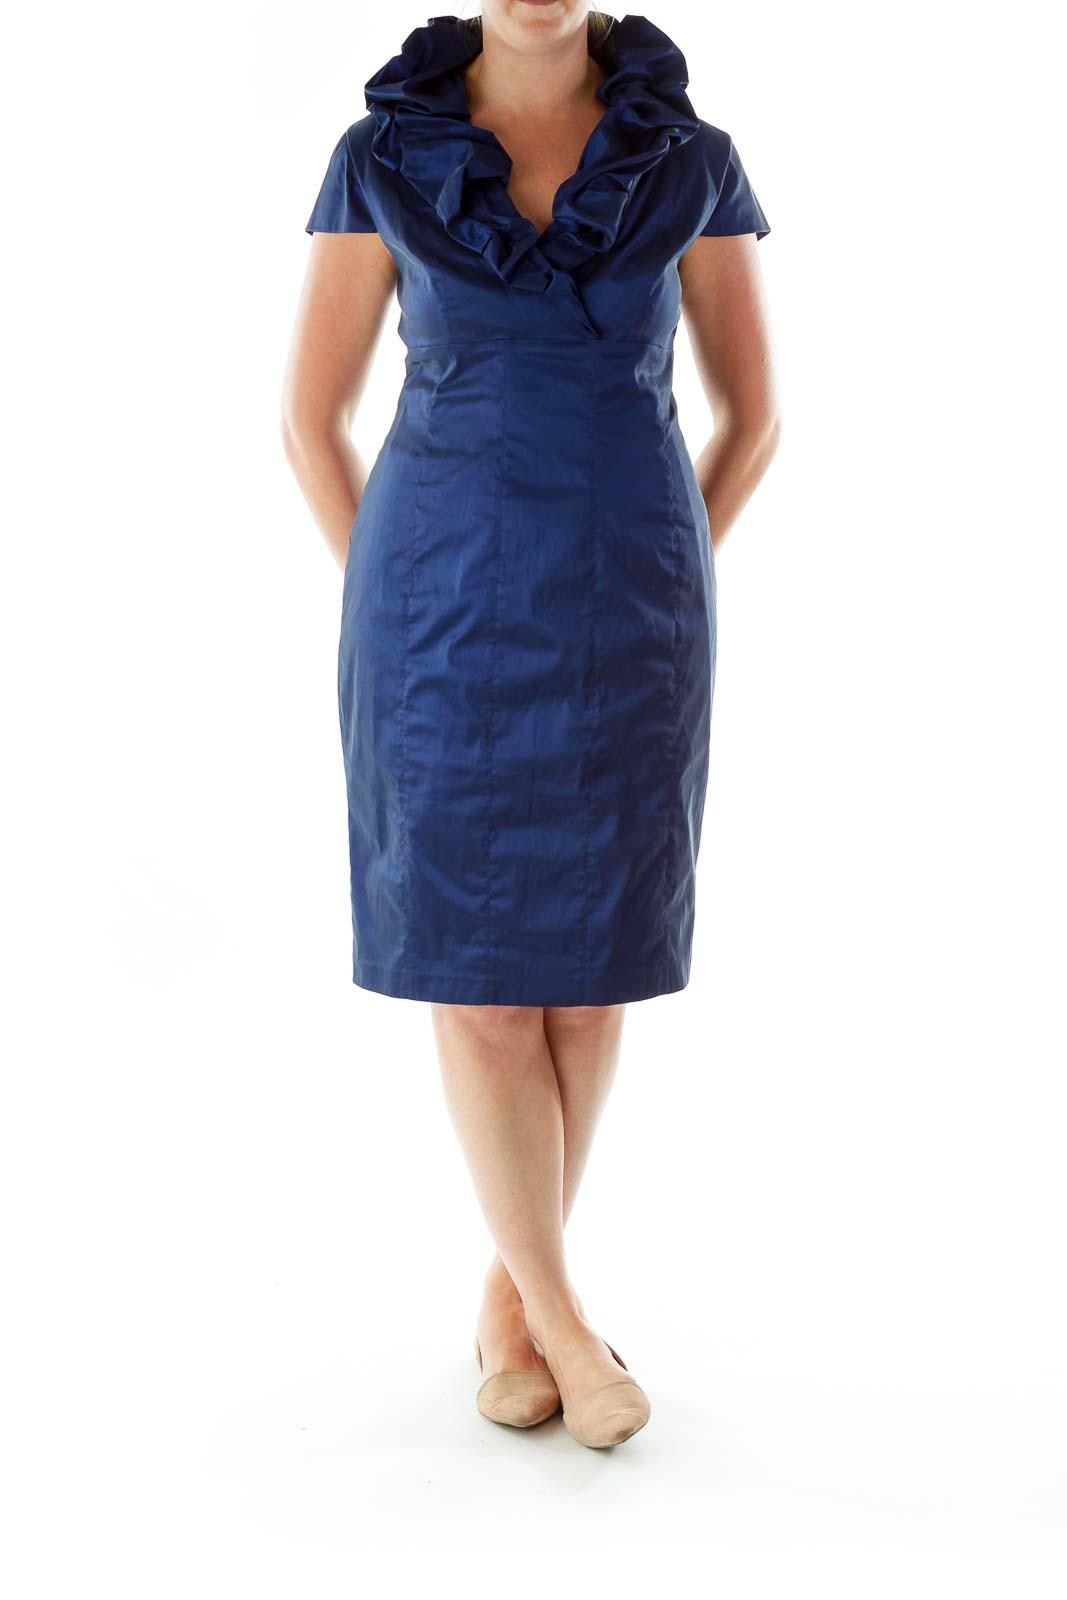 Blue Collared Evening Dress